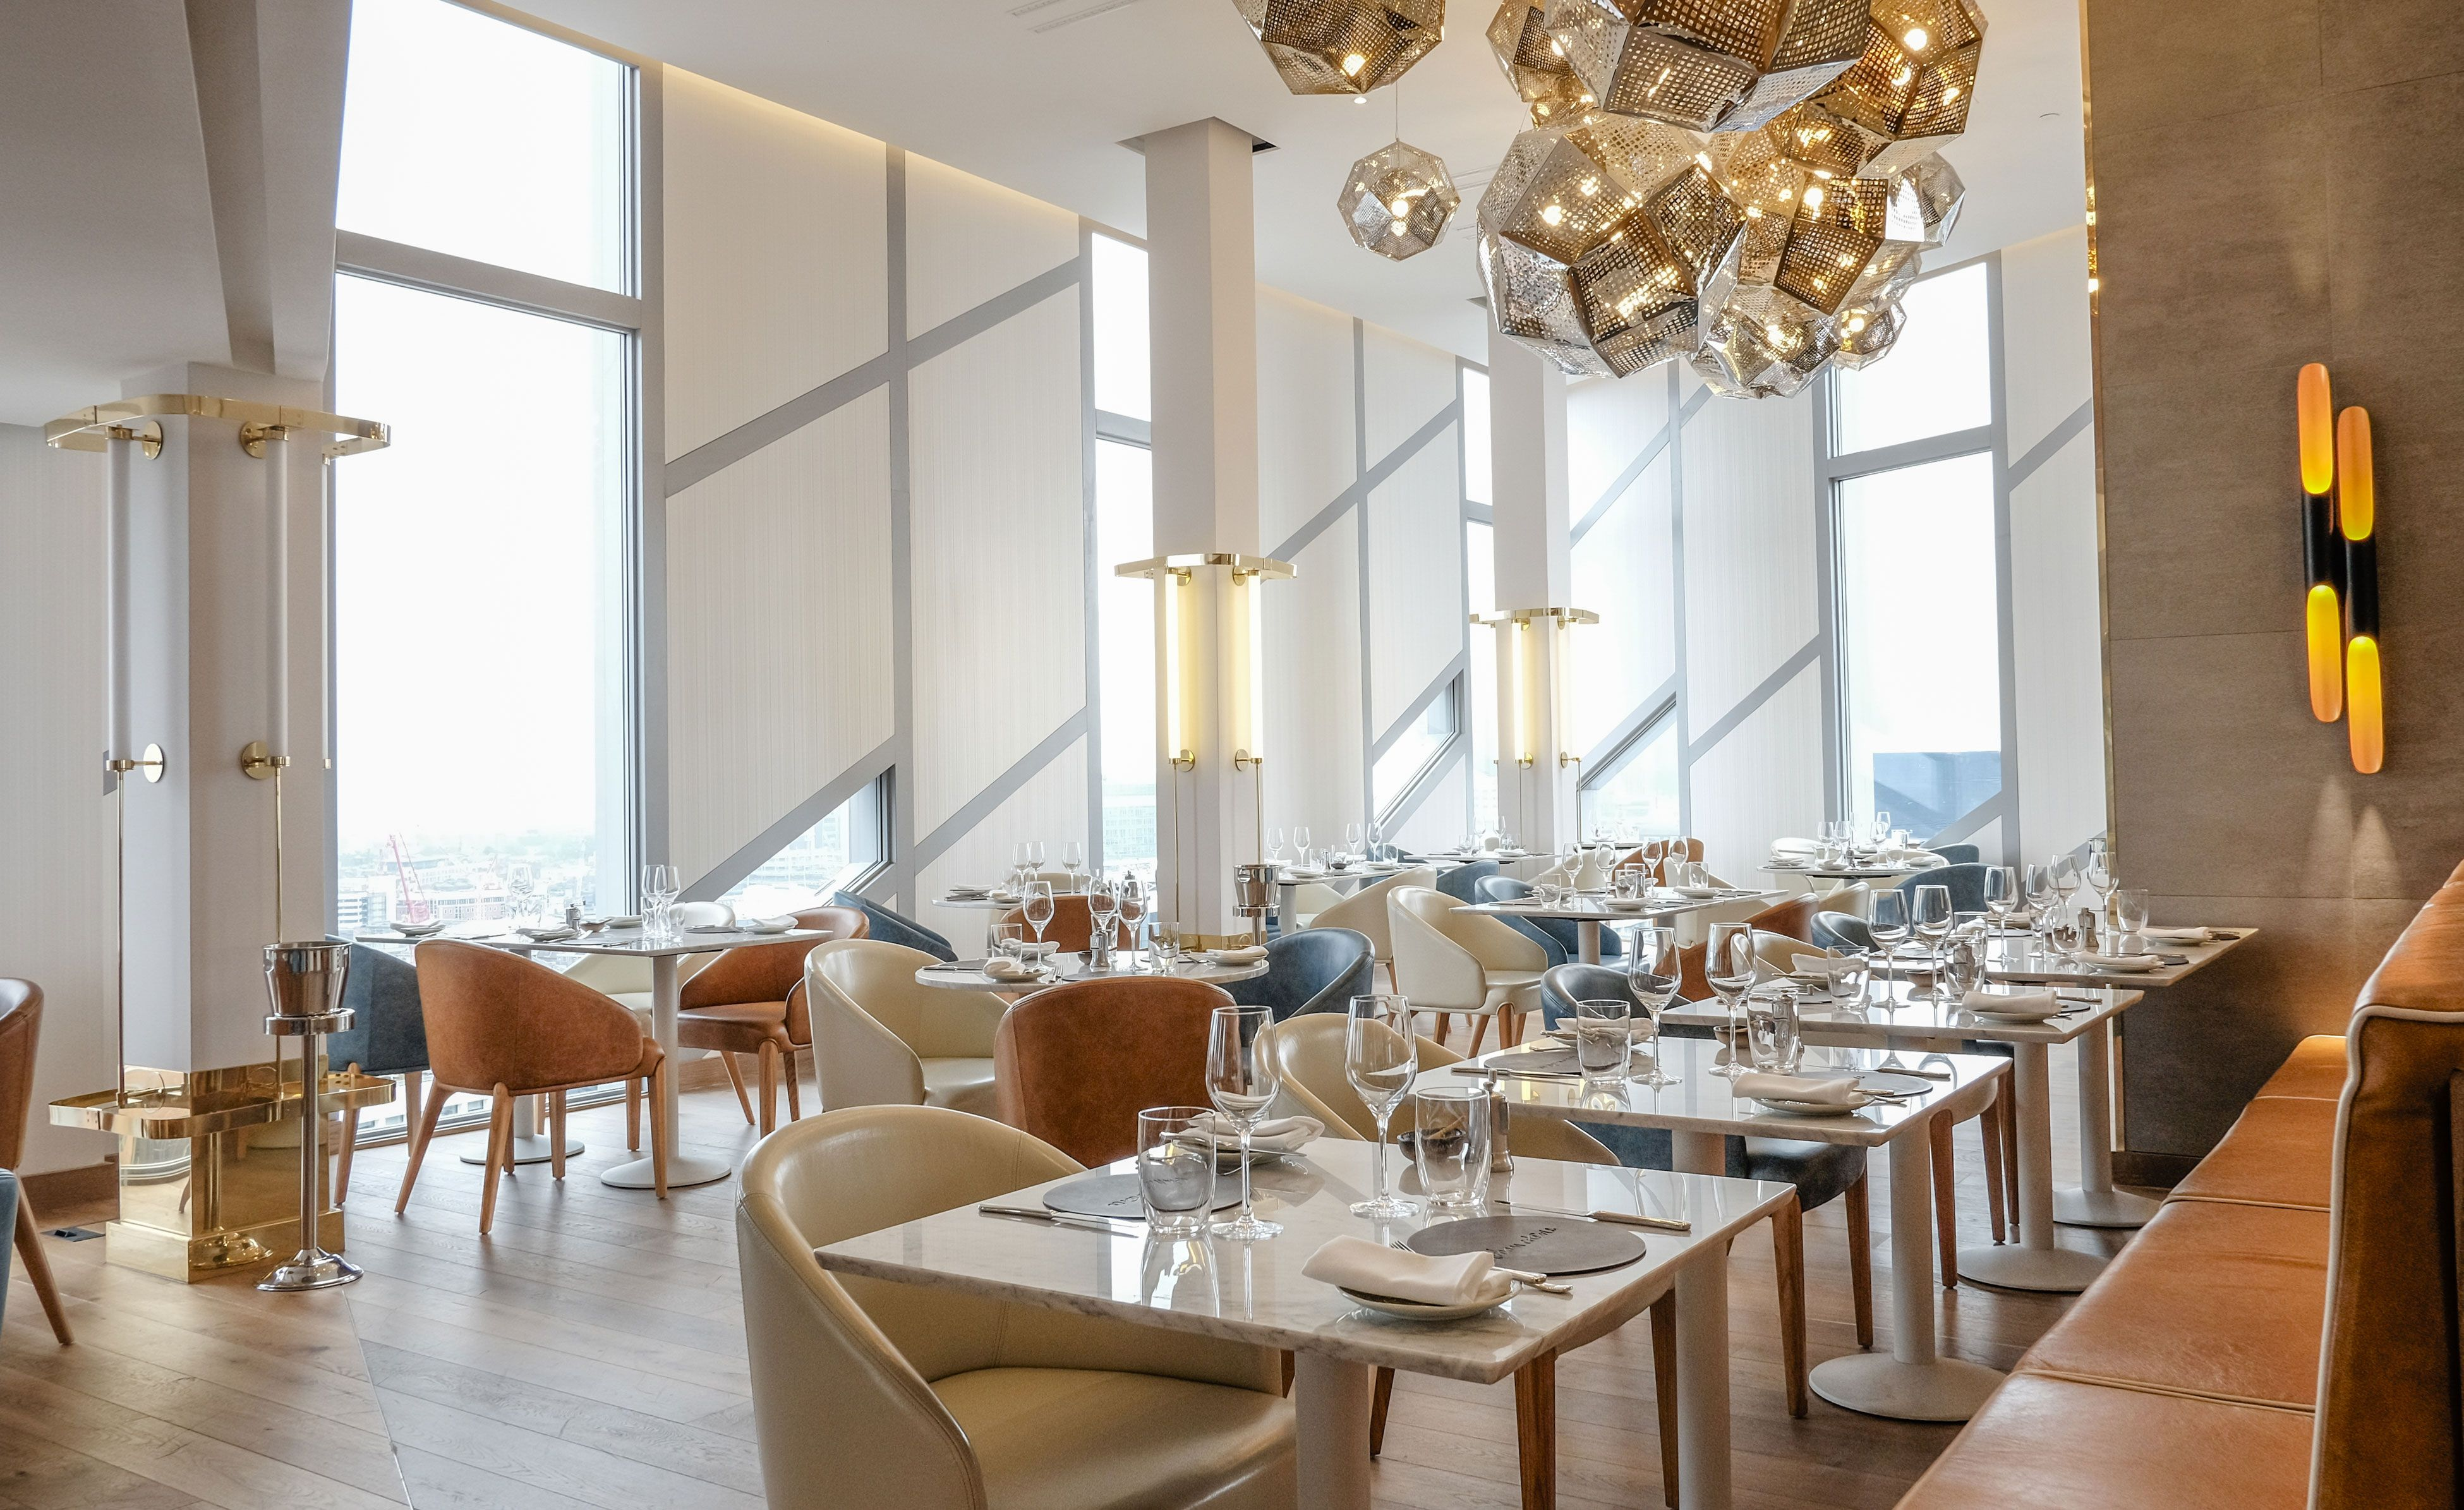 Urban Coterie restaurant - London, UK | Restaurant interior design ...